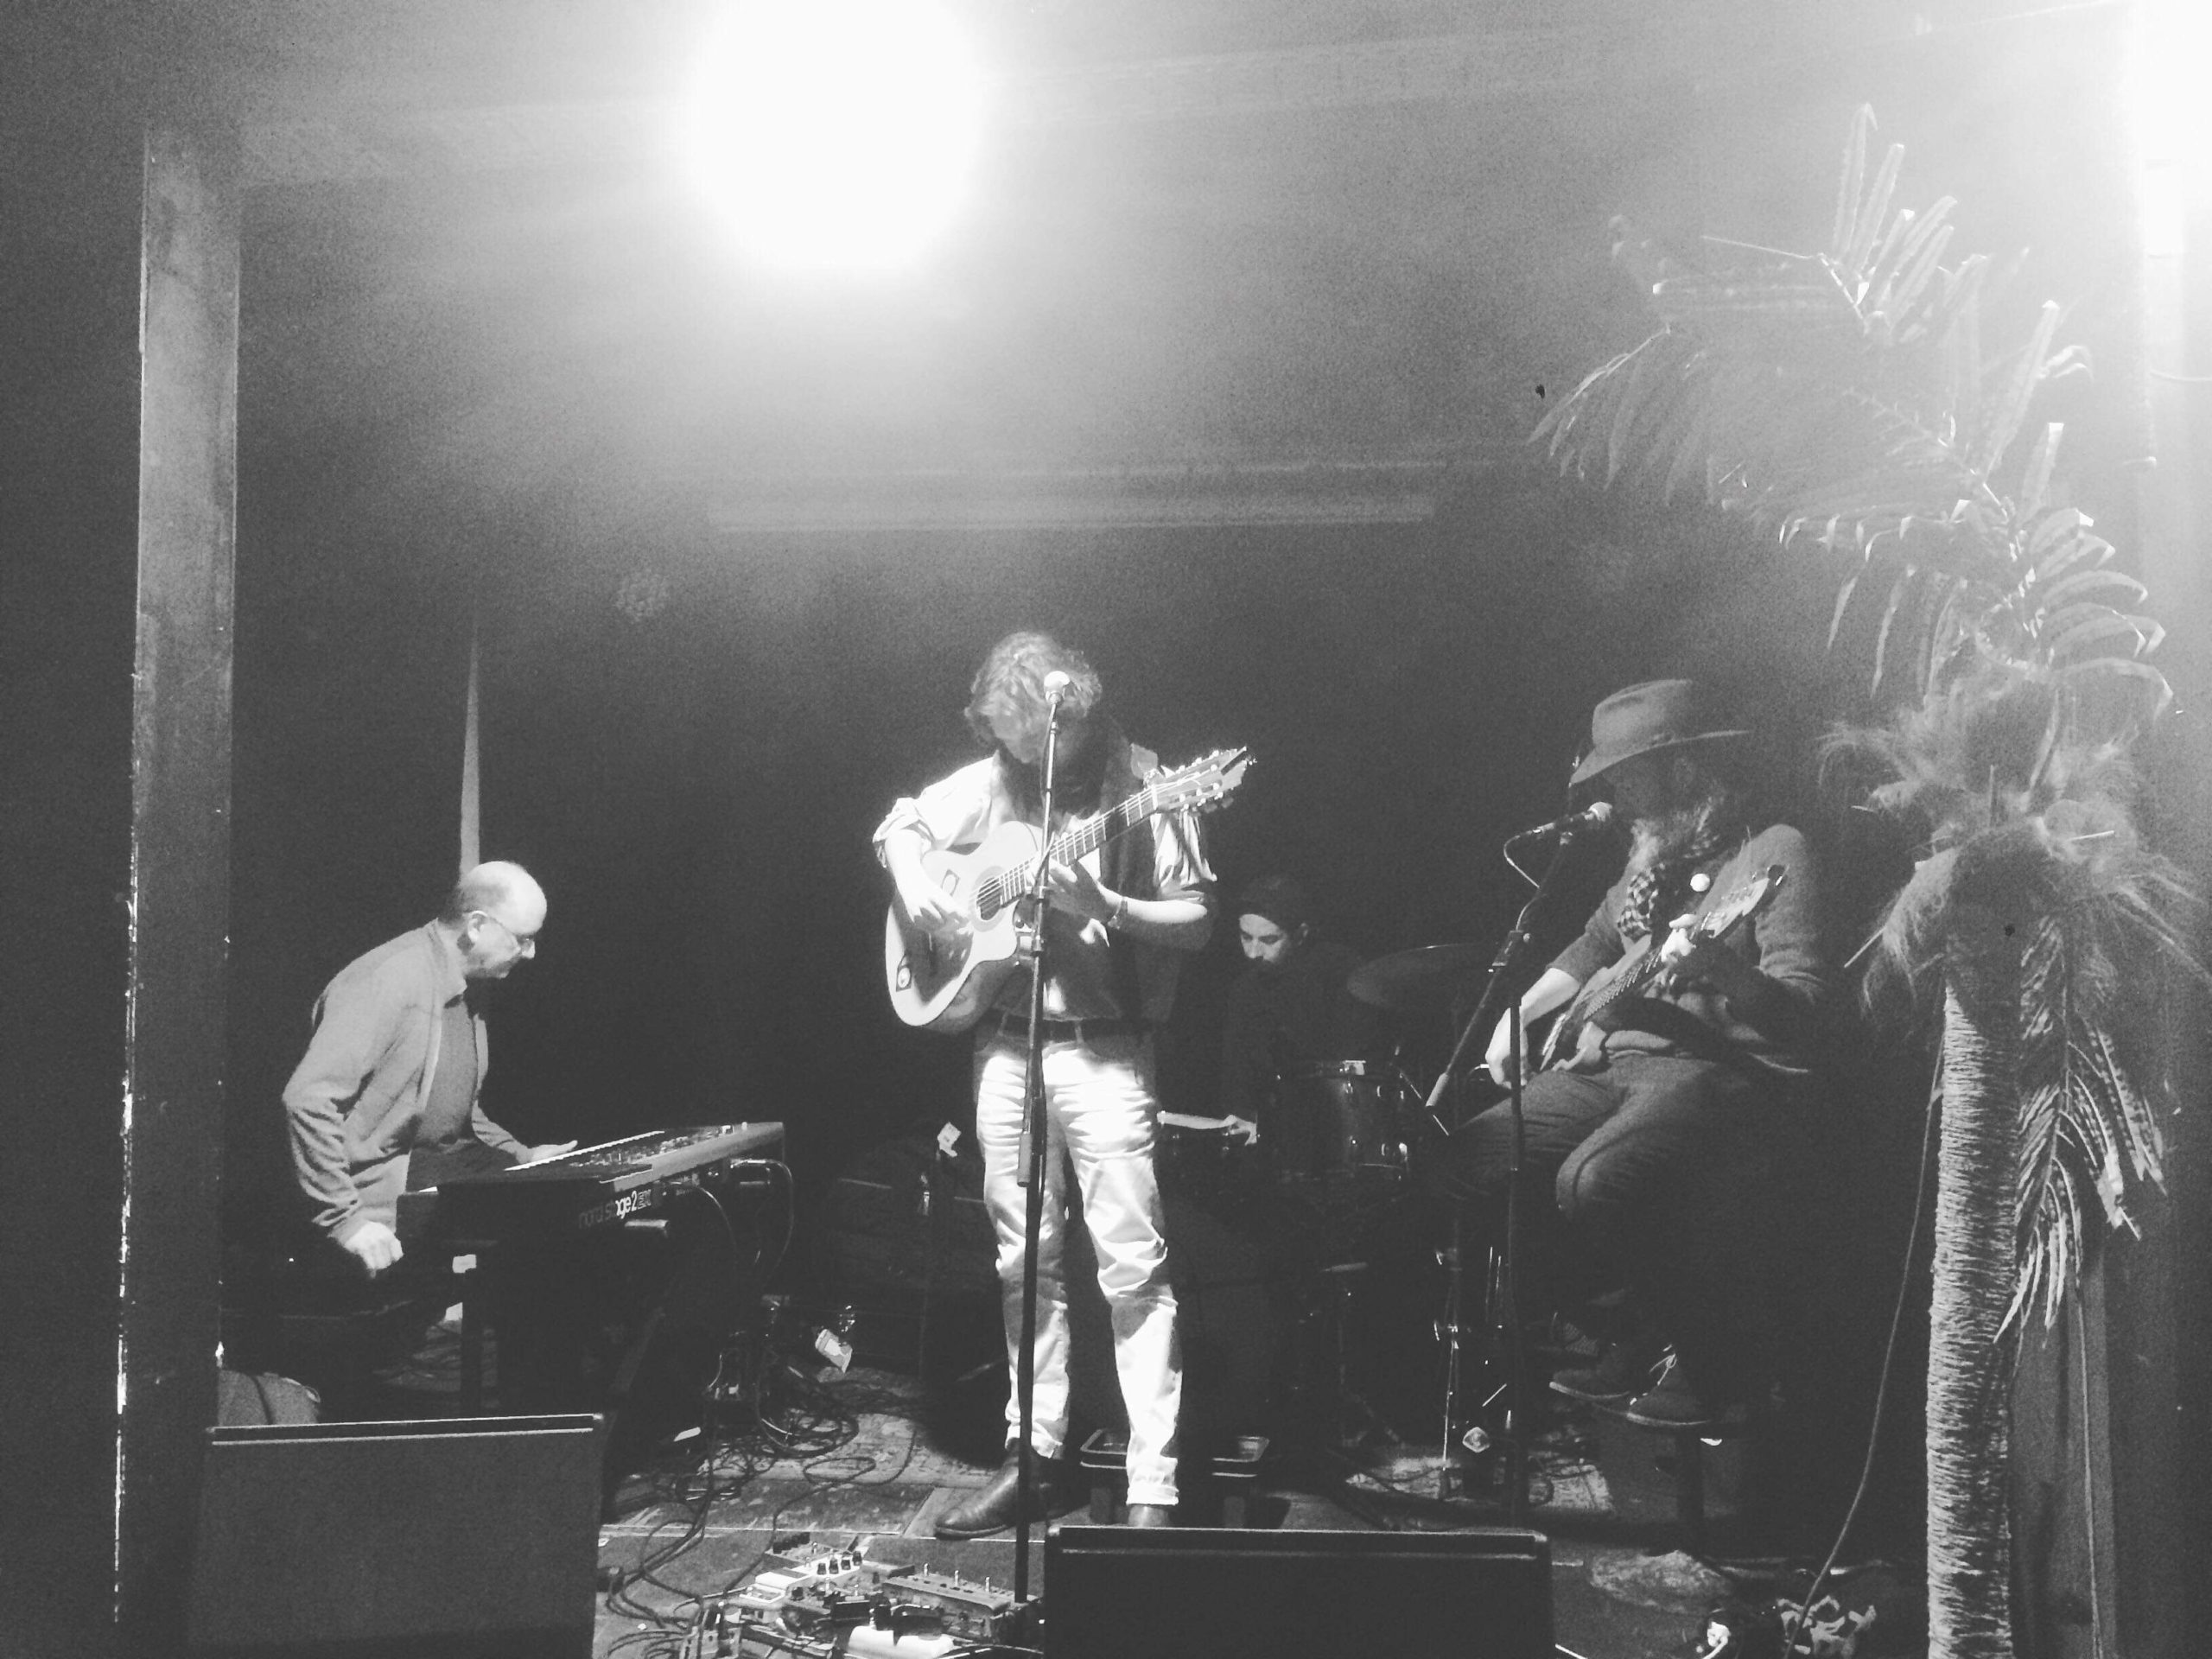 Ned Collette Band (Abrahams/Talia/Kinbom)